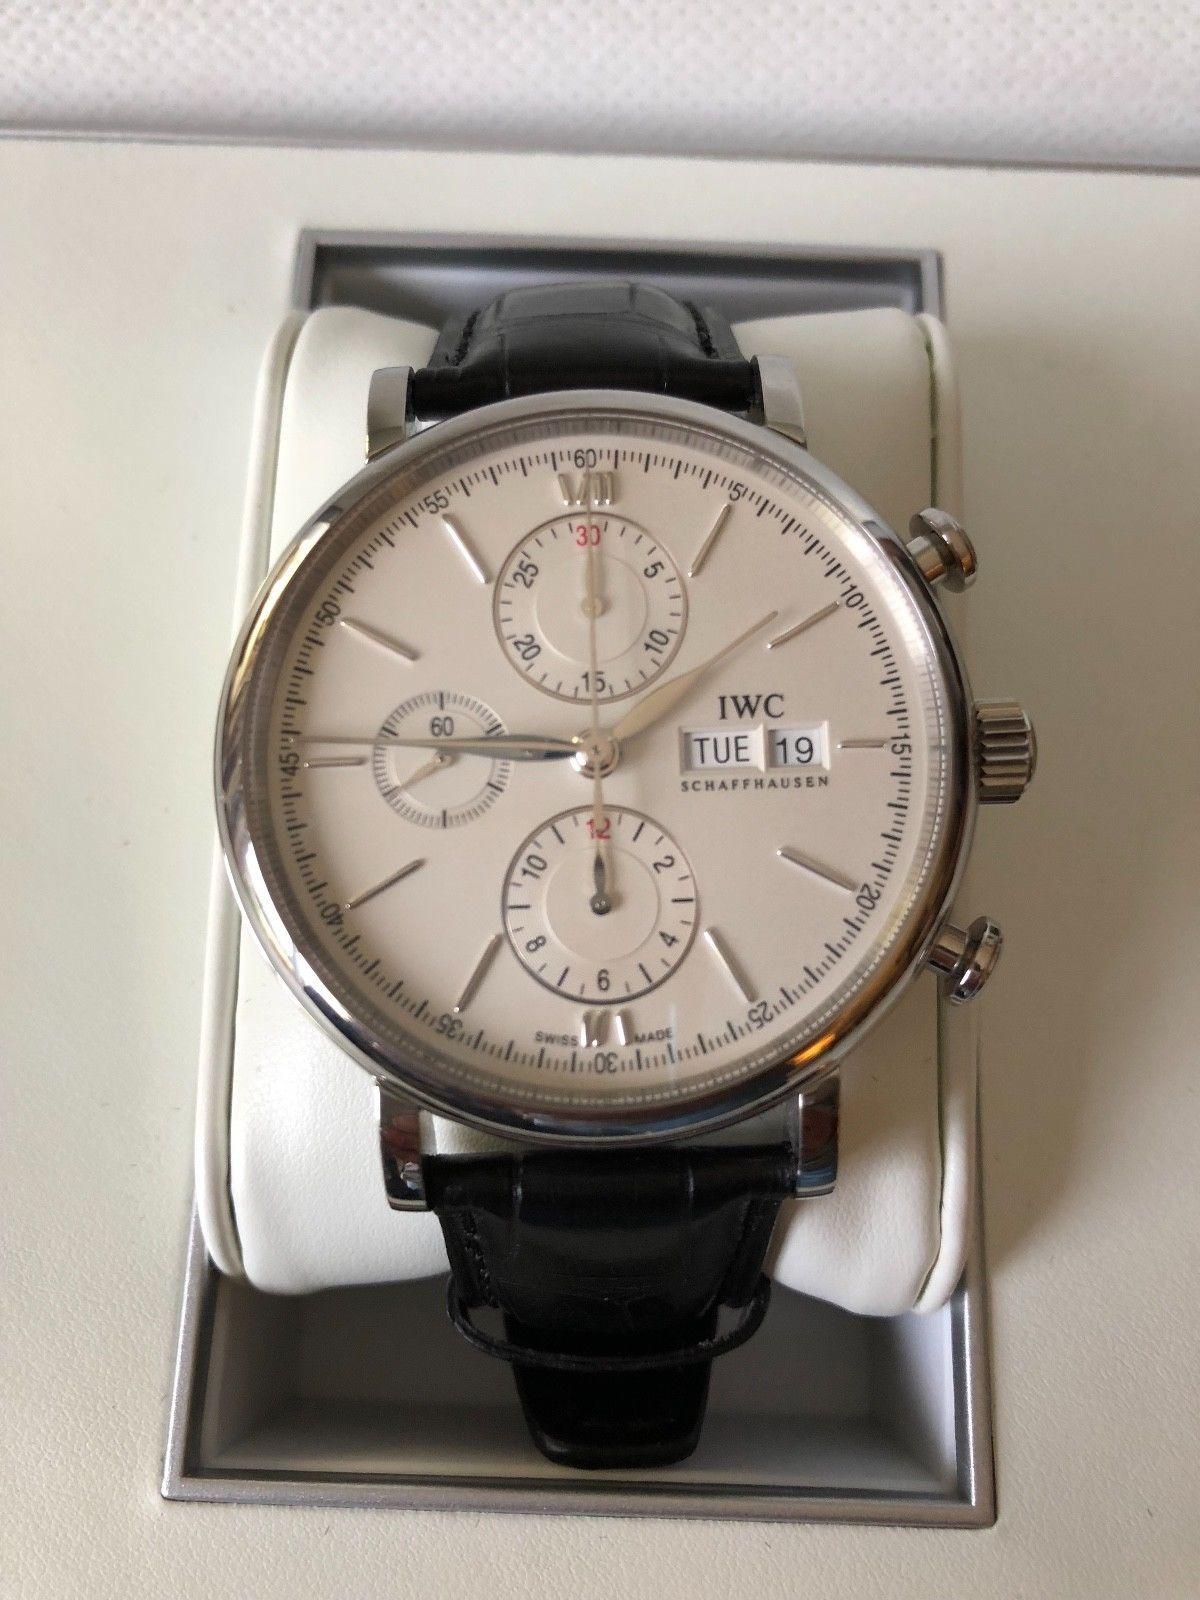 online store 247e2 60463 IWC Portofino Chronograph IW391007 Wrist Watch for Men | IWC ...